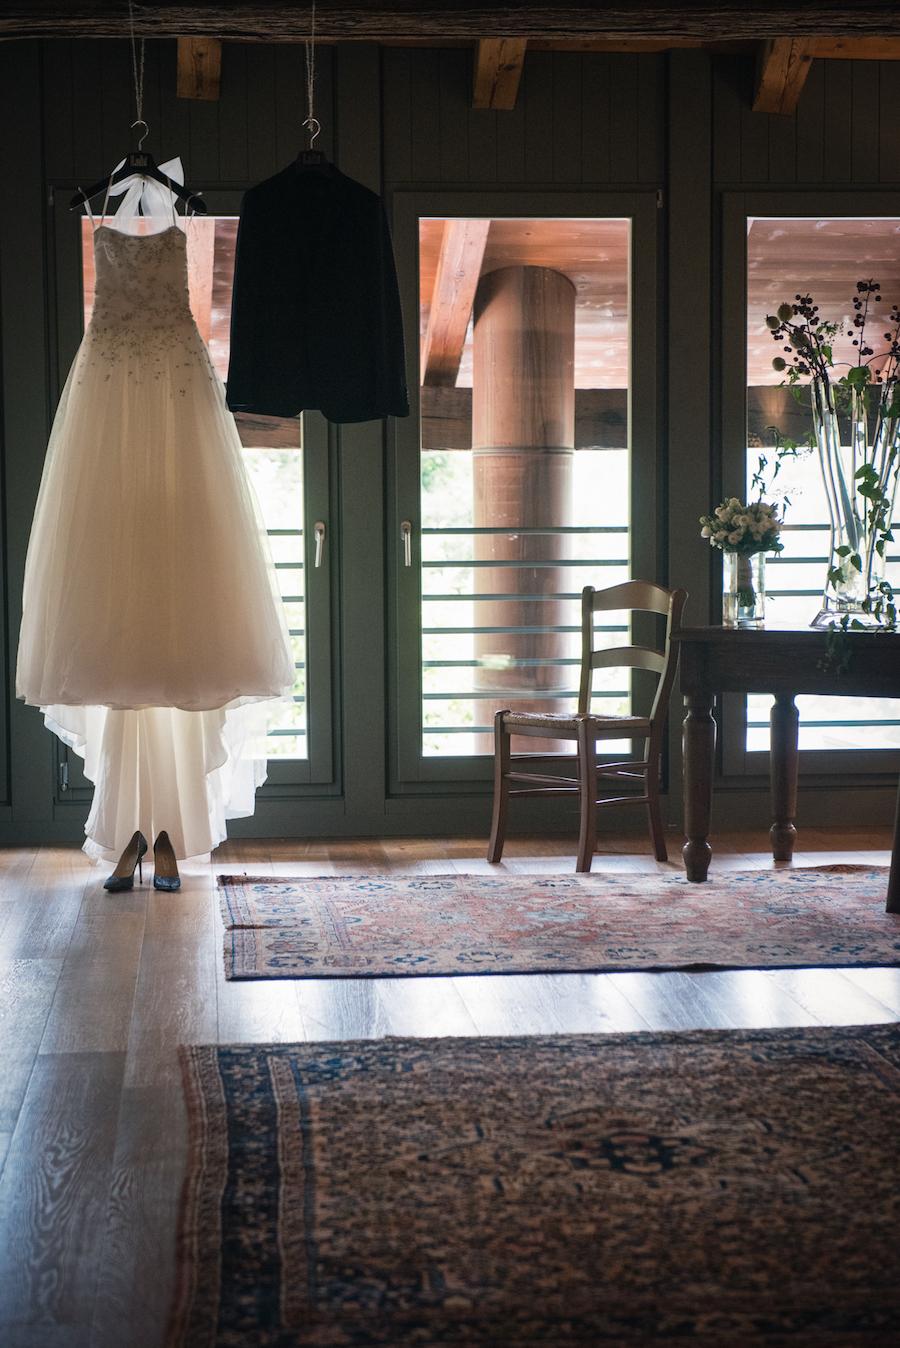 Matrimonio Simbolico Idee : Wedding wonderland pagina di idee per matrimoni